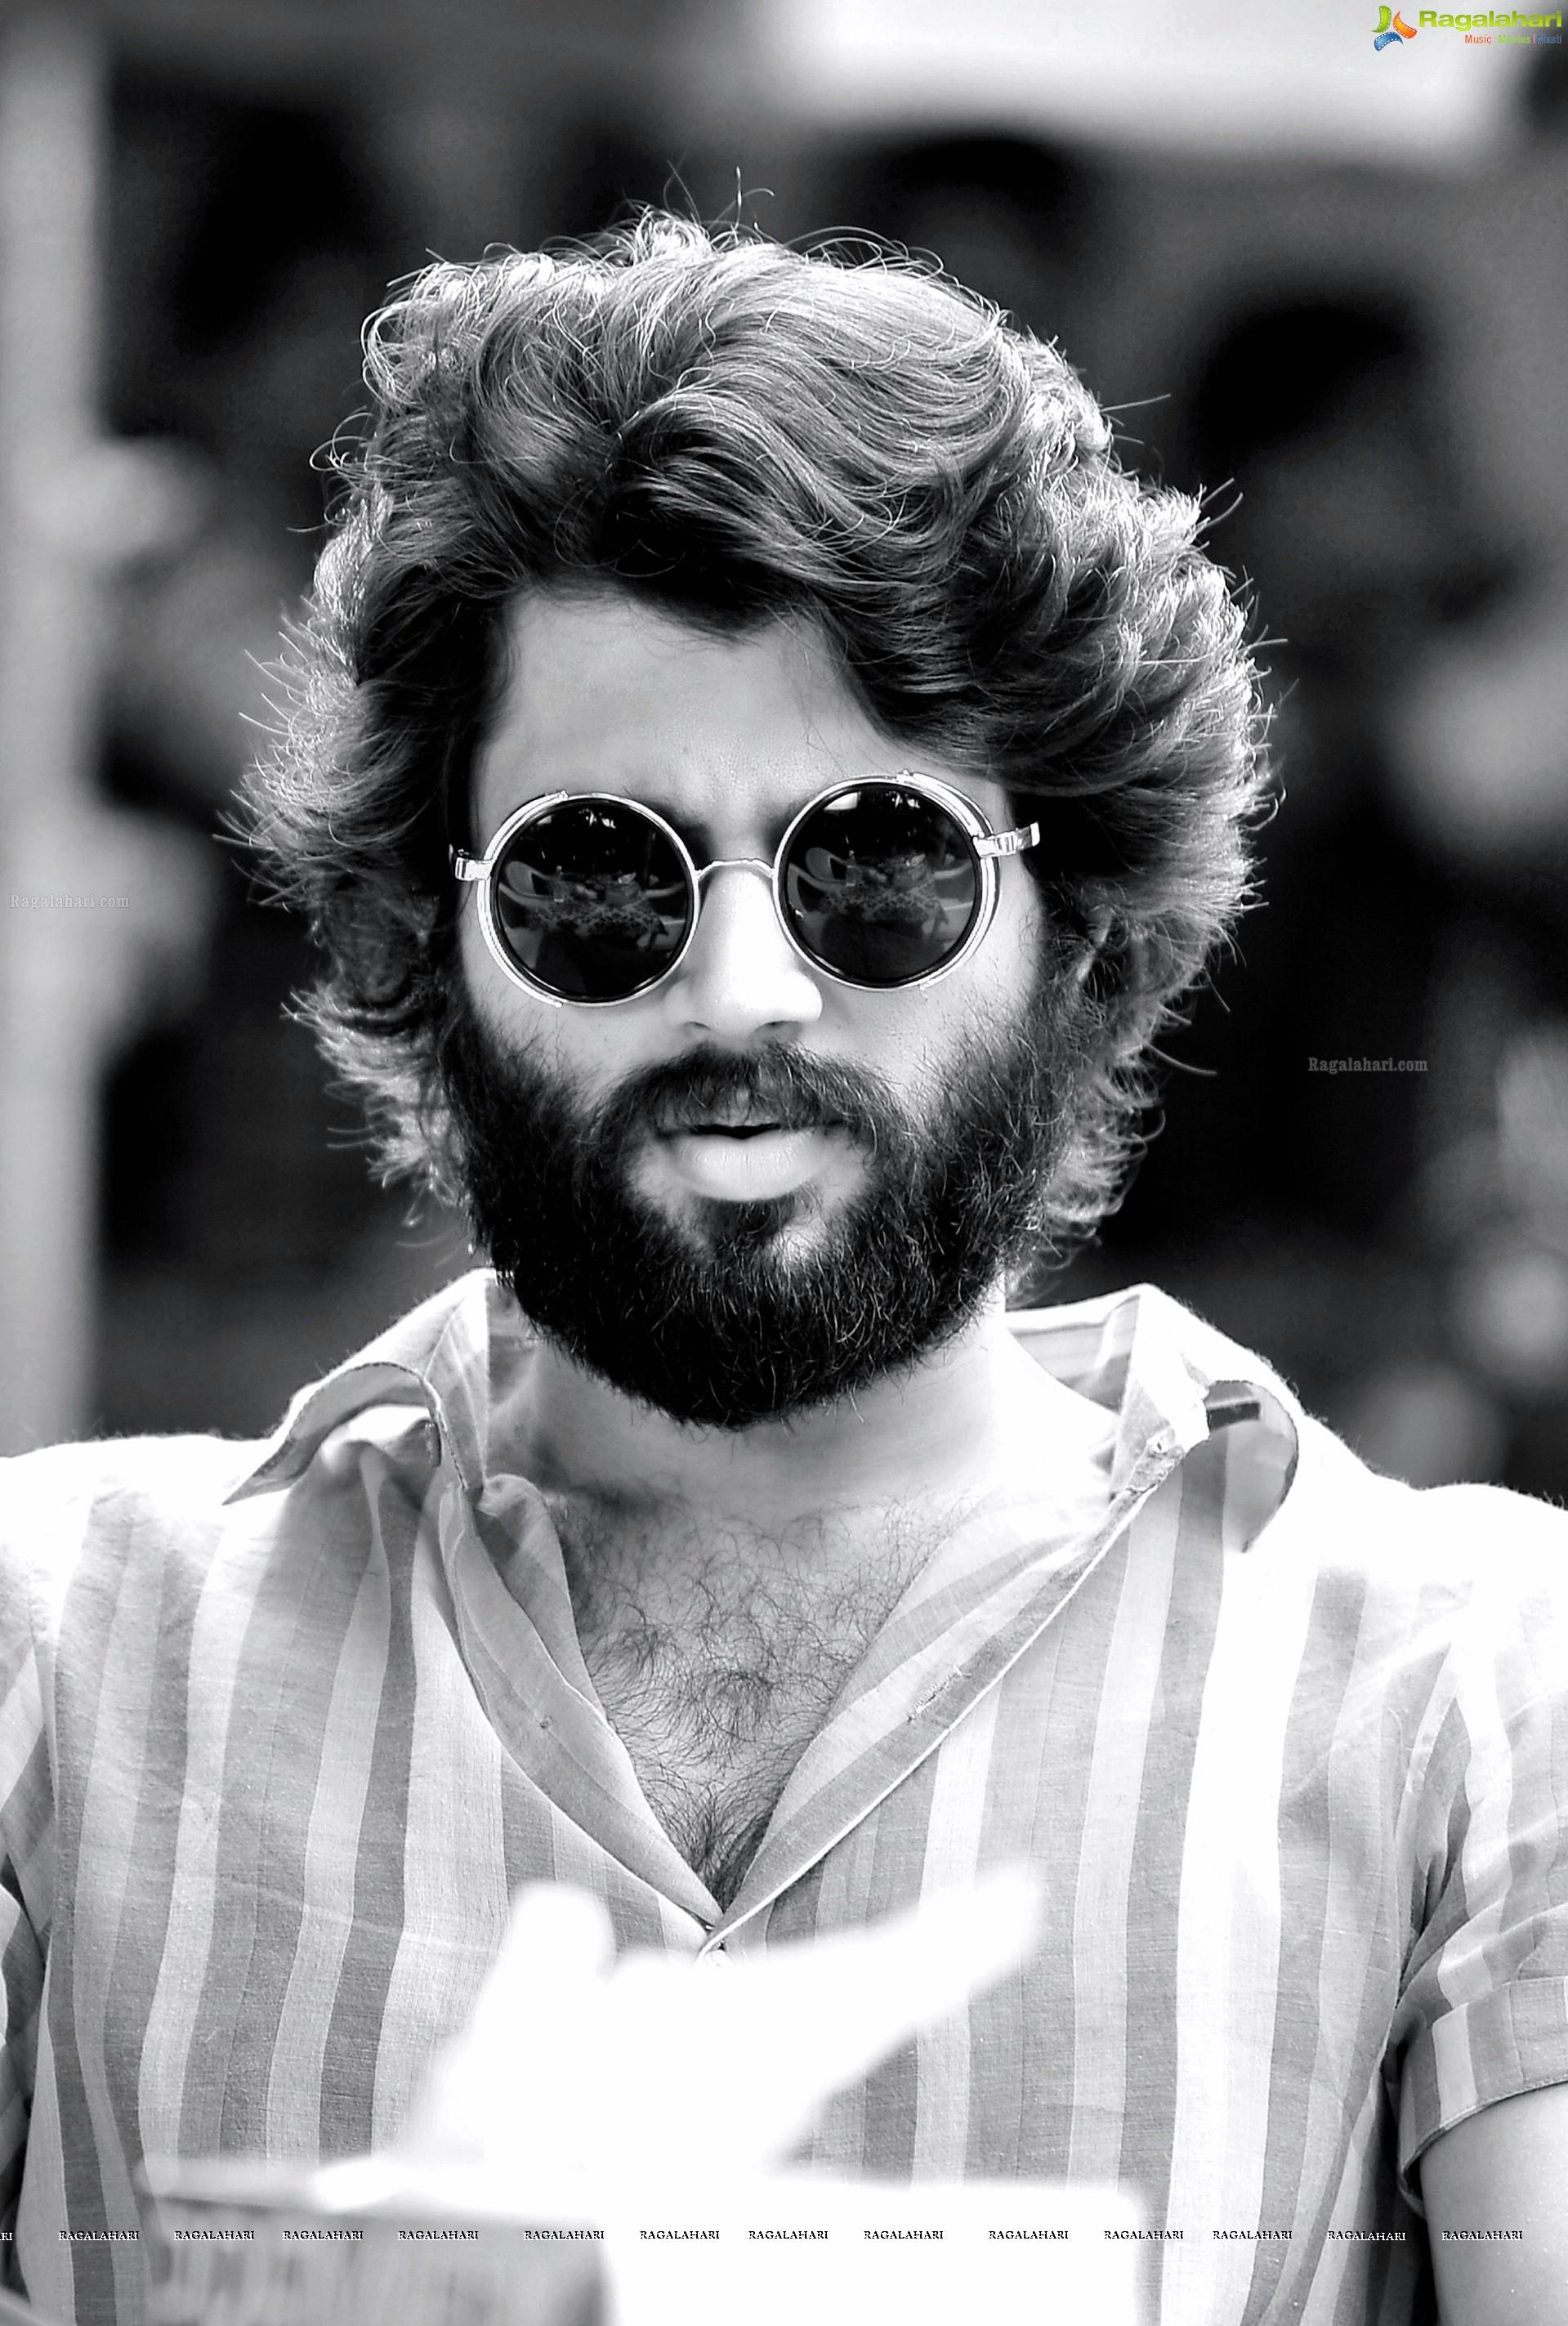 Vijay Devarakonda Hd Image 1 Tollywood Actor Gallery Photoshoot